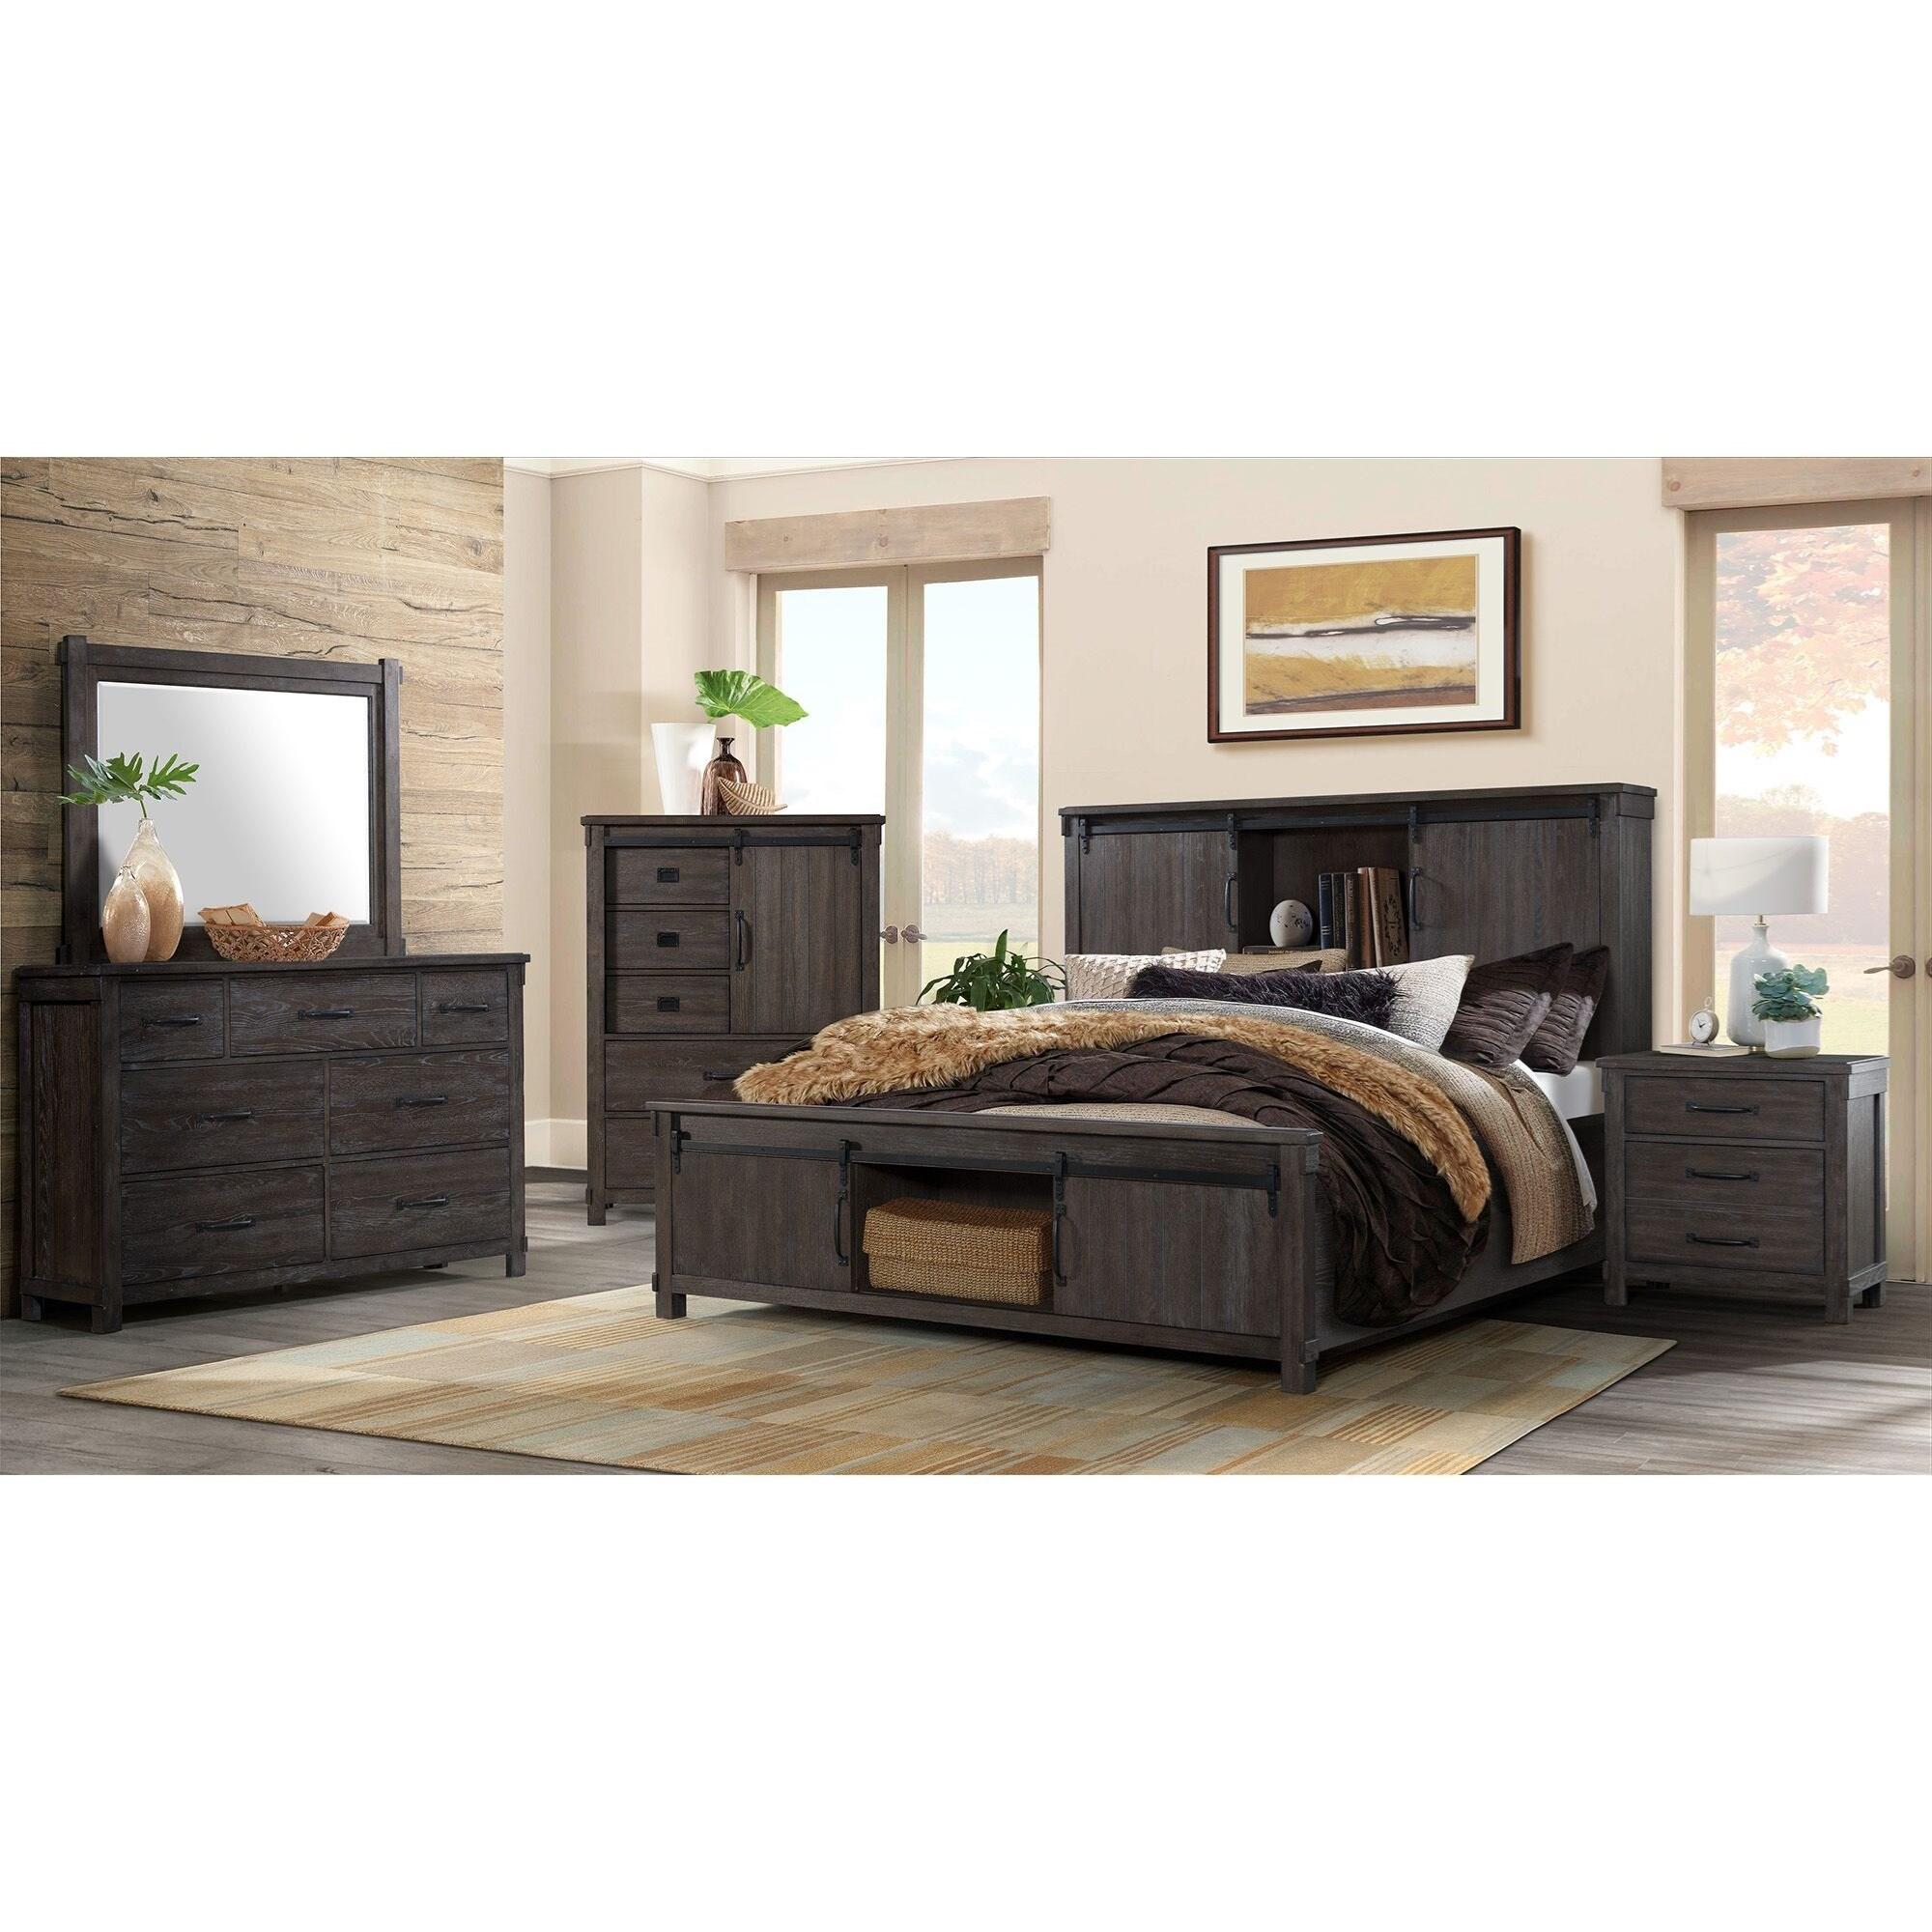 Scott Queen Bedroom Group by Elements International at Smart Buy Furniture